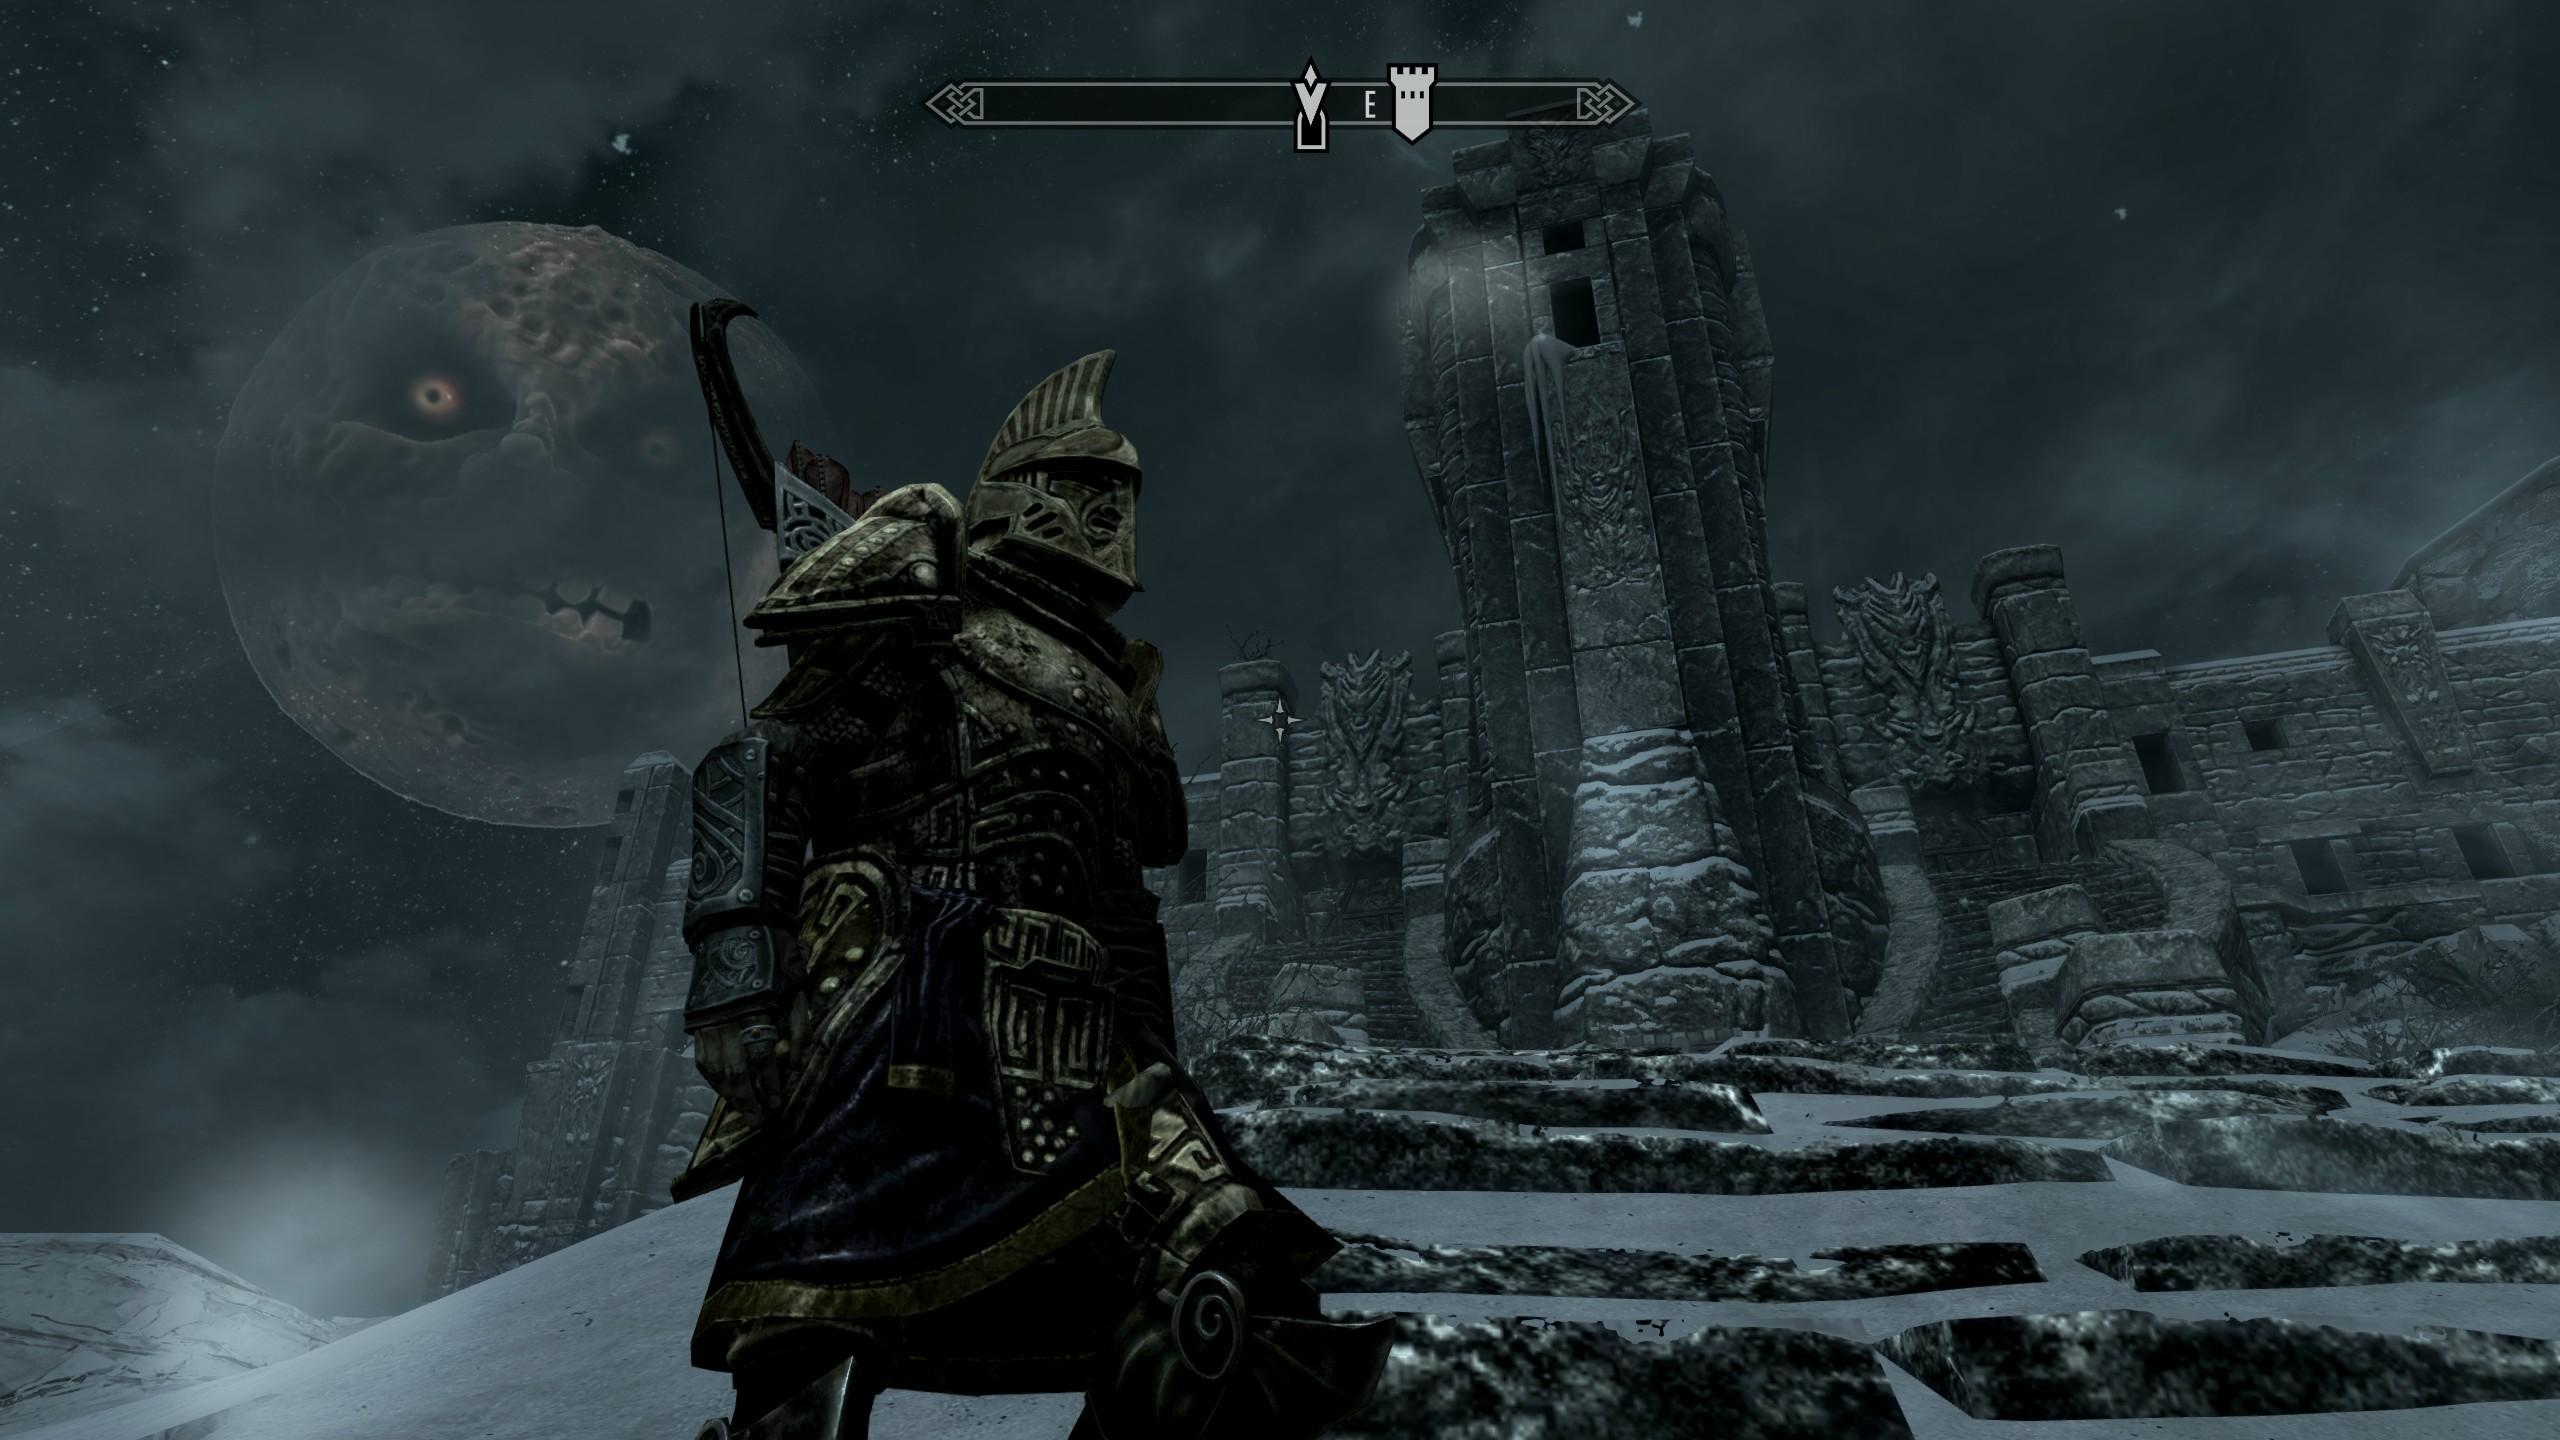 The Elder Scrolls V Skyrim Hd Wallpaper Background Image 2560x1440 Id 184413 Wallpaper Abyss